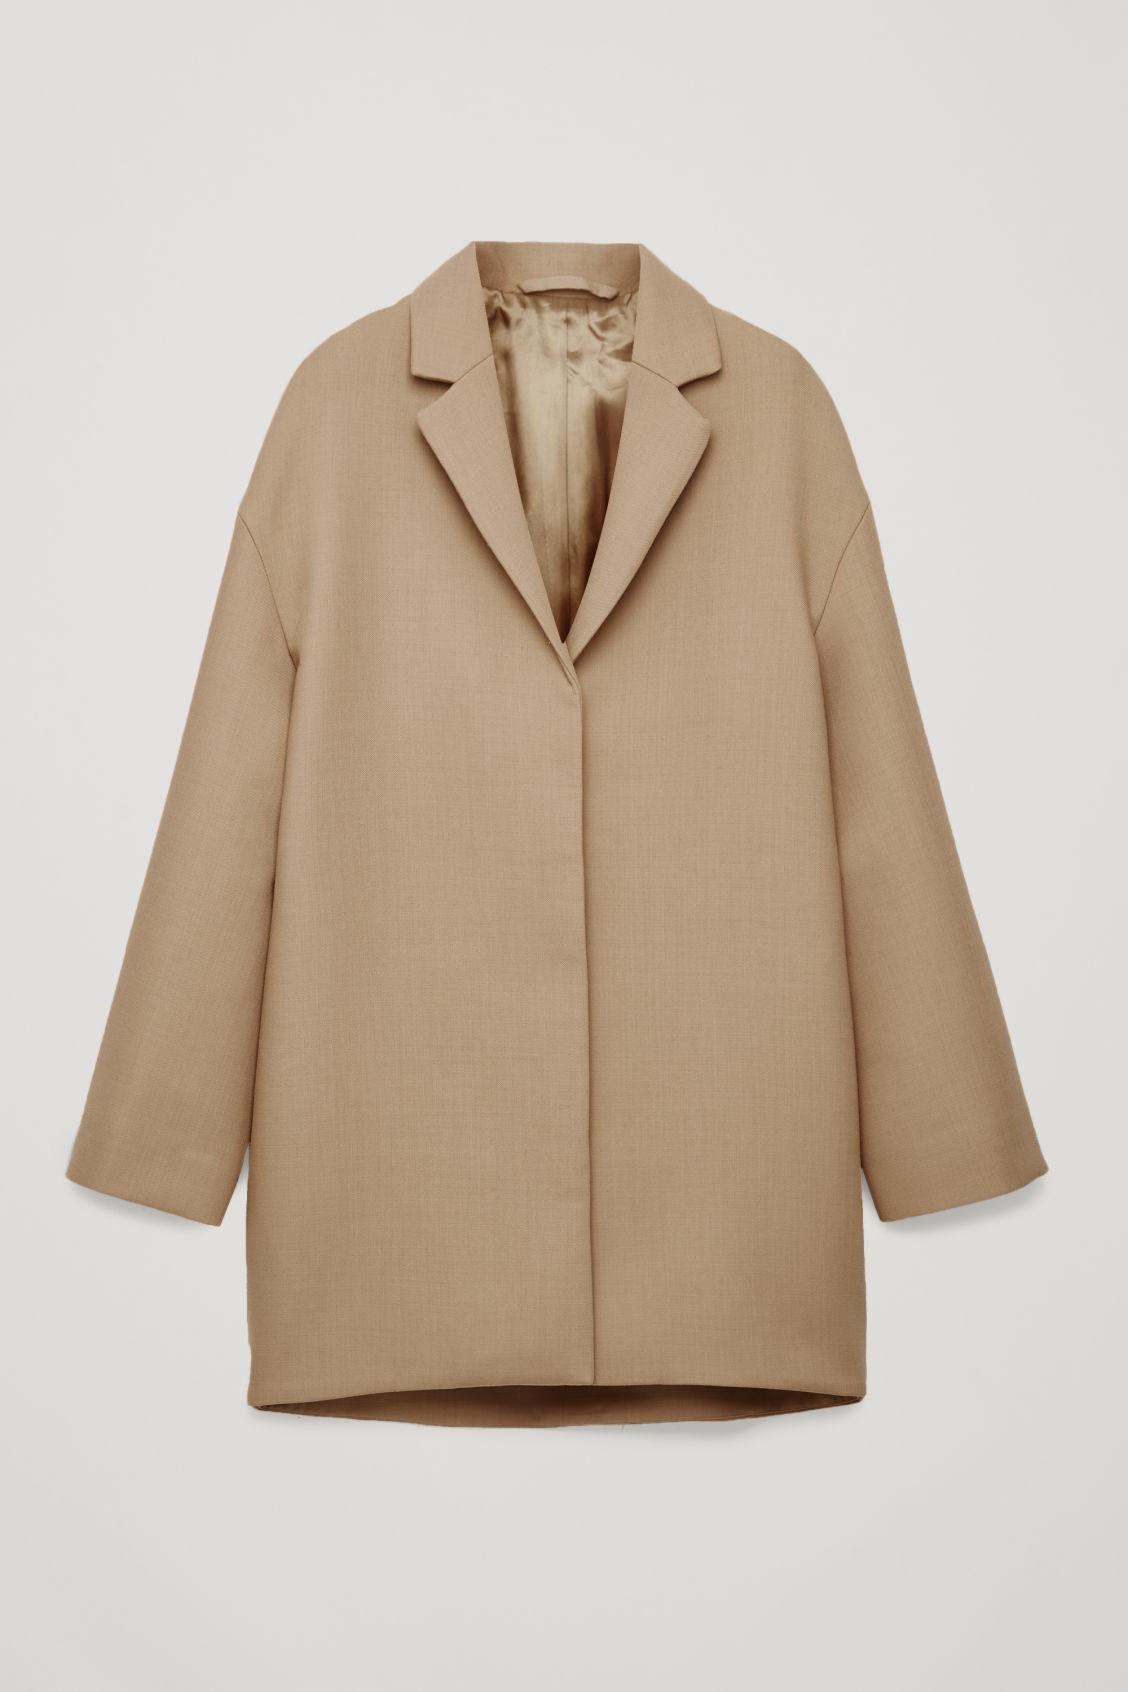 Cos Wool-Blend Cocoon Coat In Beige